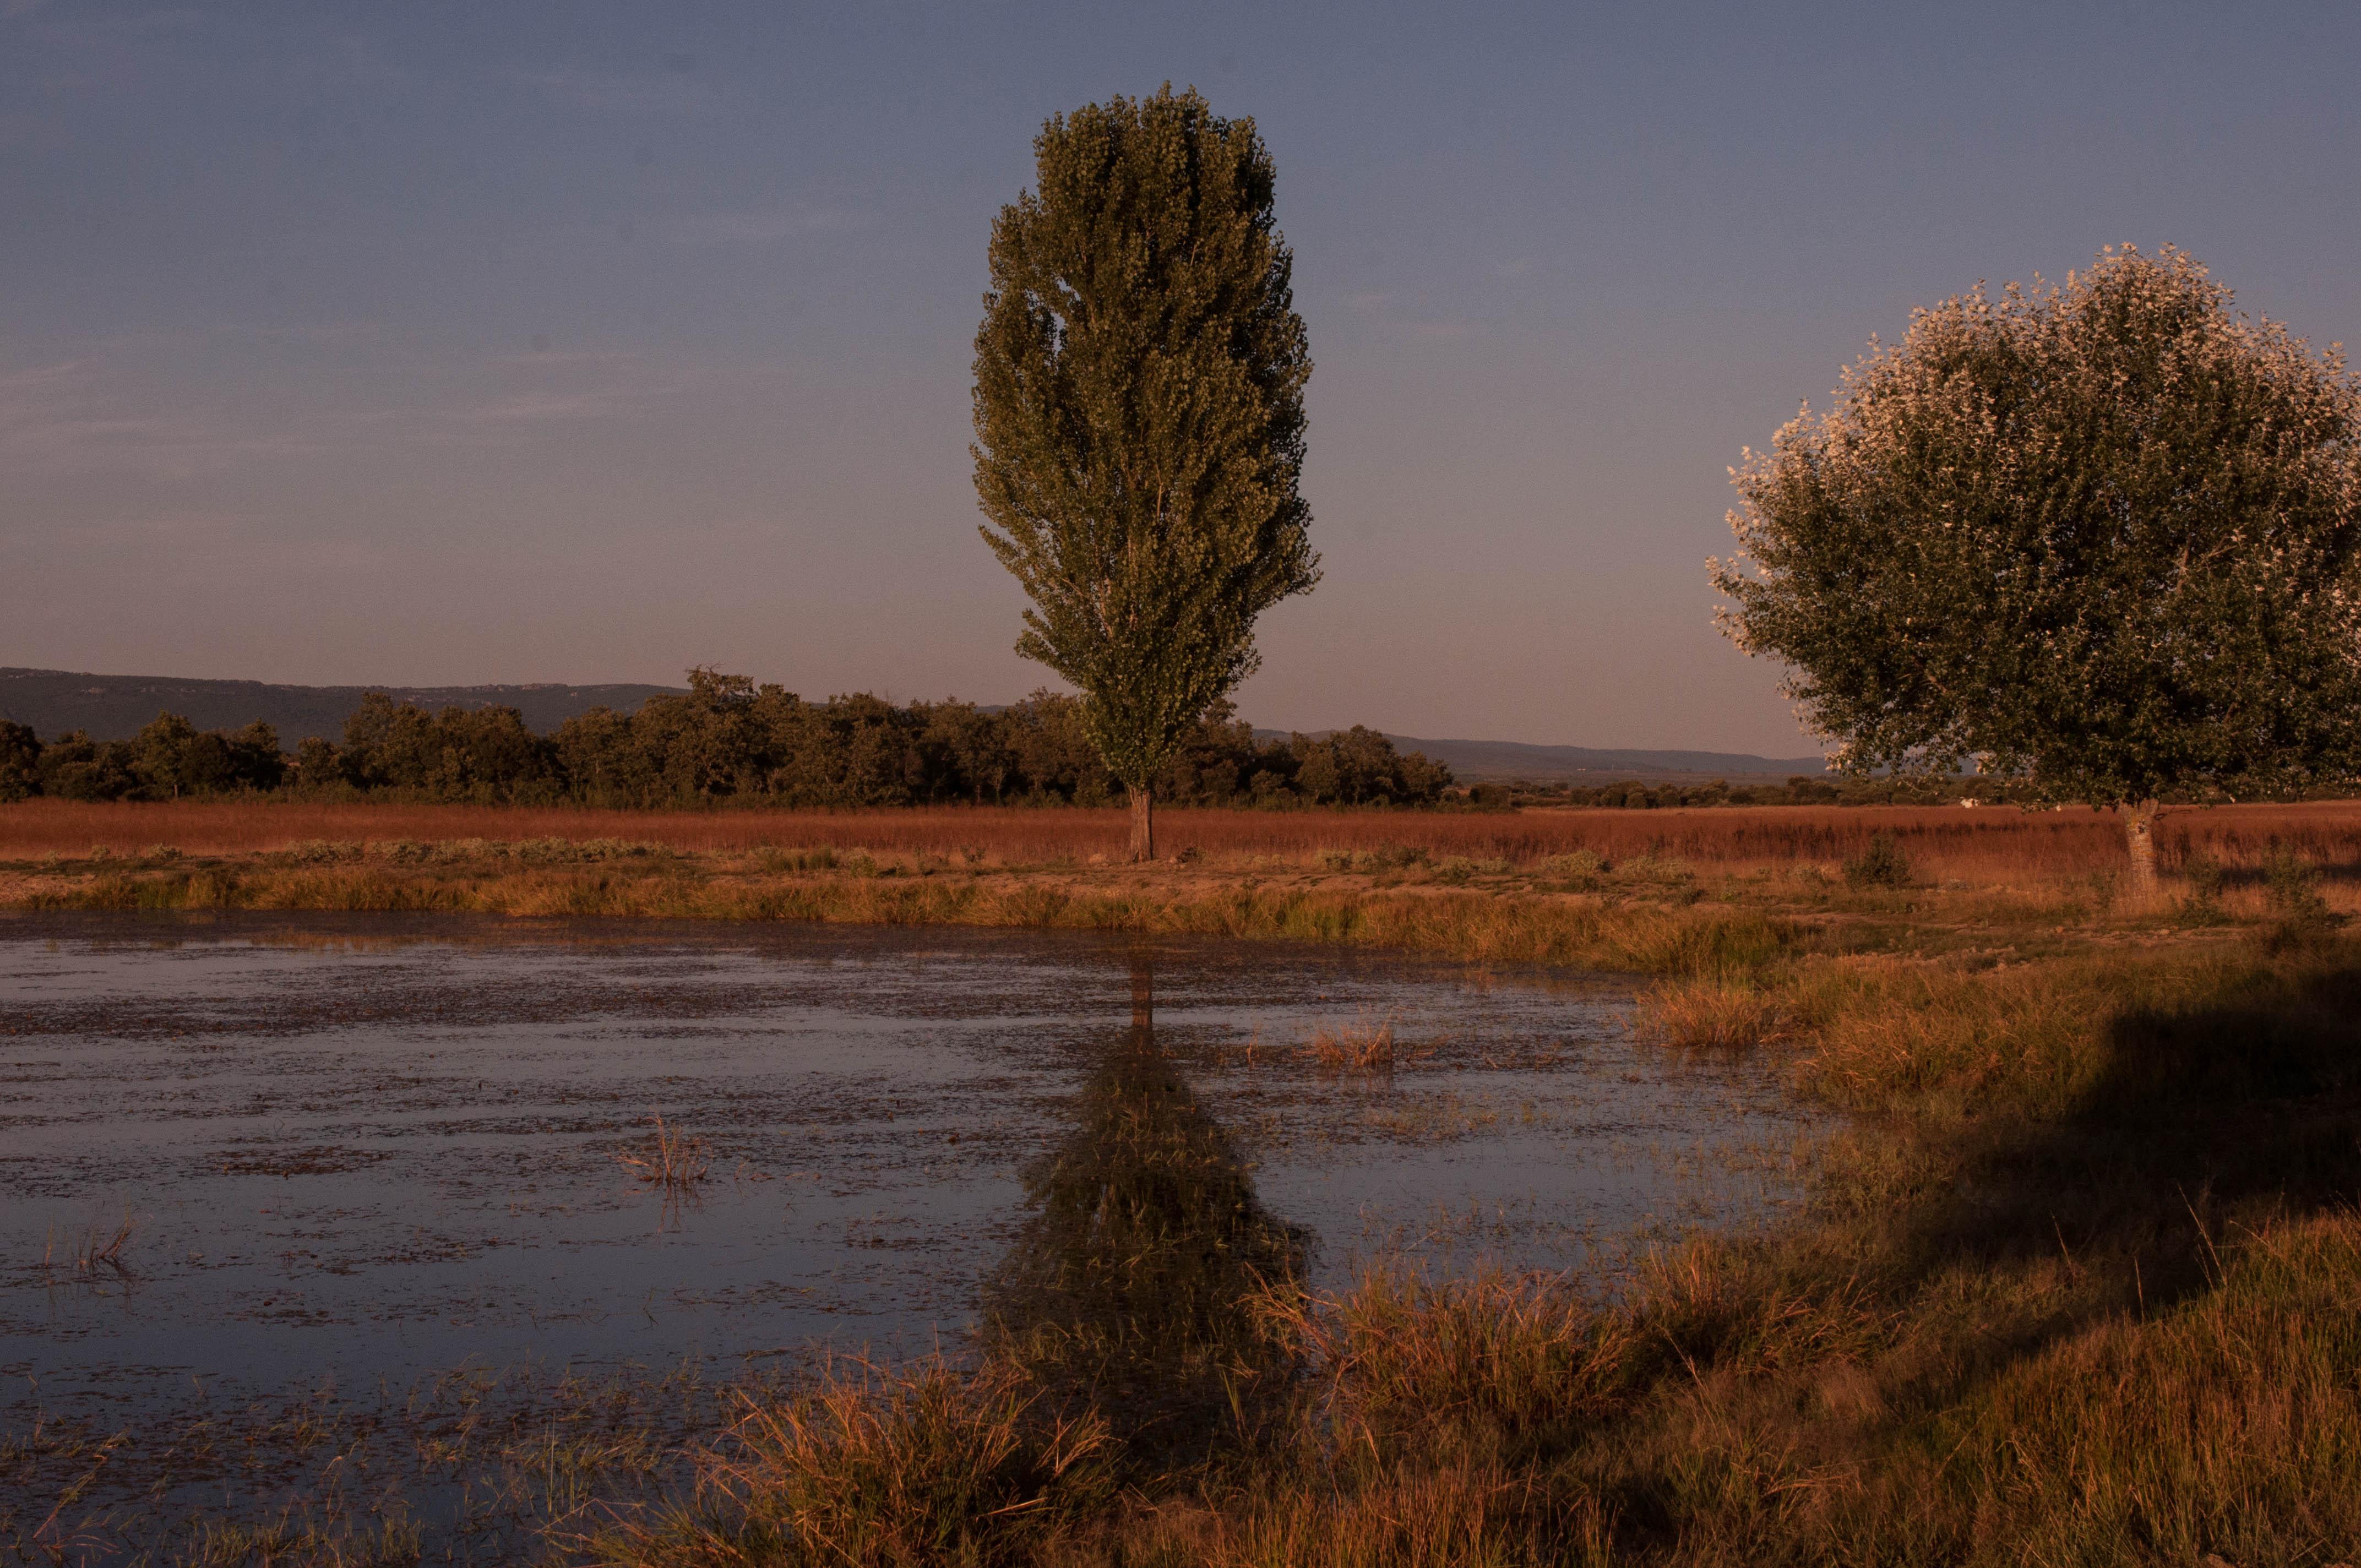 Populus alba laguna riquijada Las Obreras de Aliste Artesanos de la miel Zamora Spain